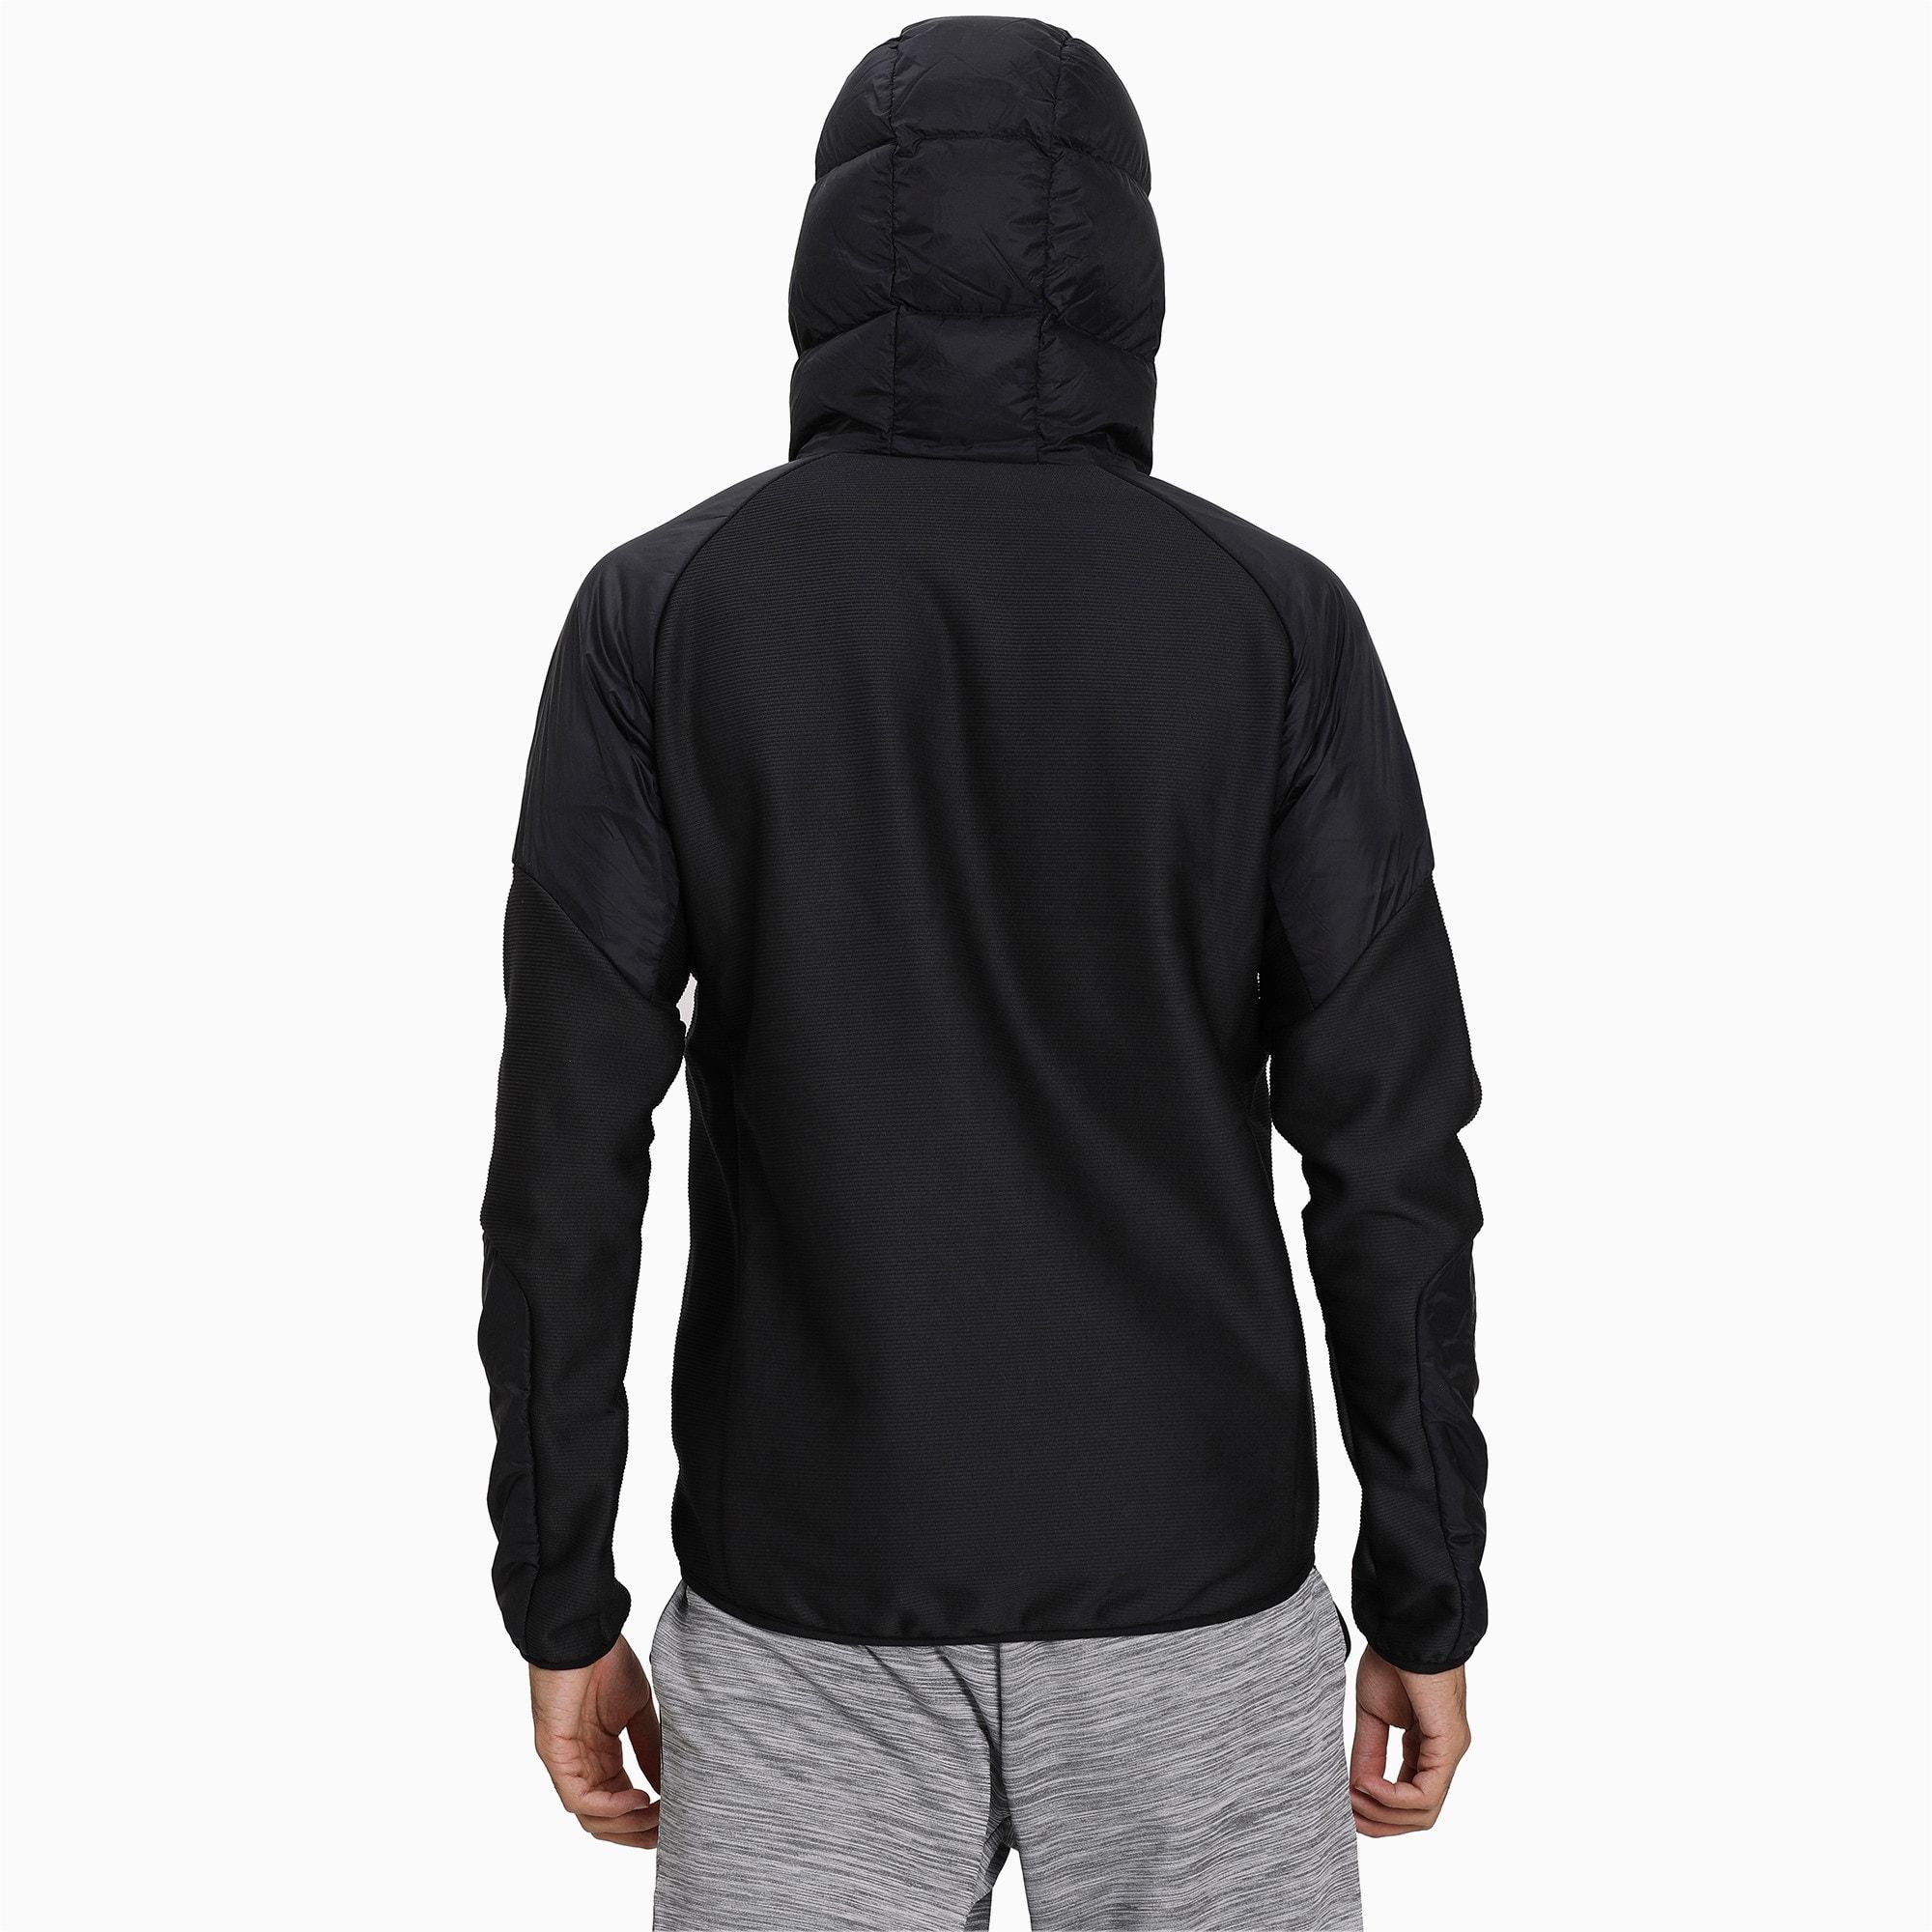 Thumbnail 2 of 600 Hybrid Down Men's Jacket, Puma Black, medium-IND